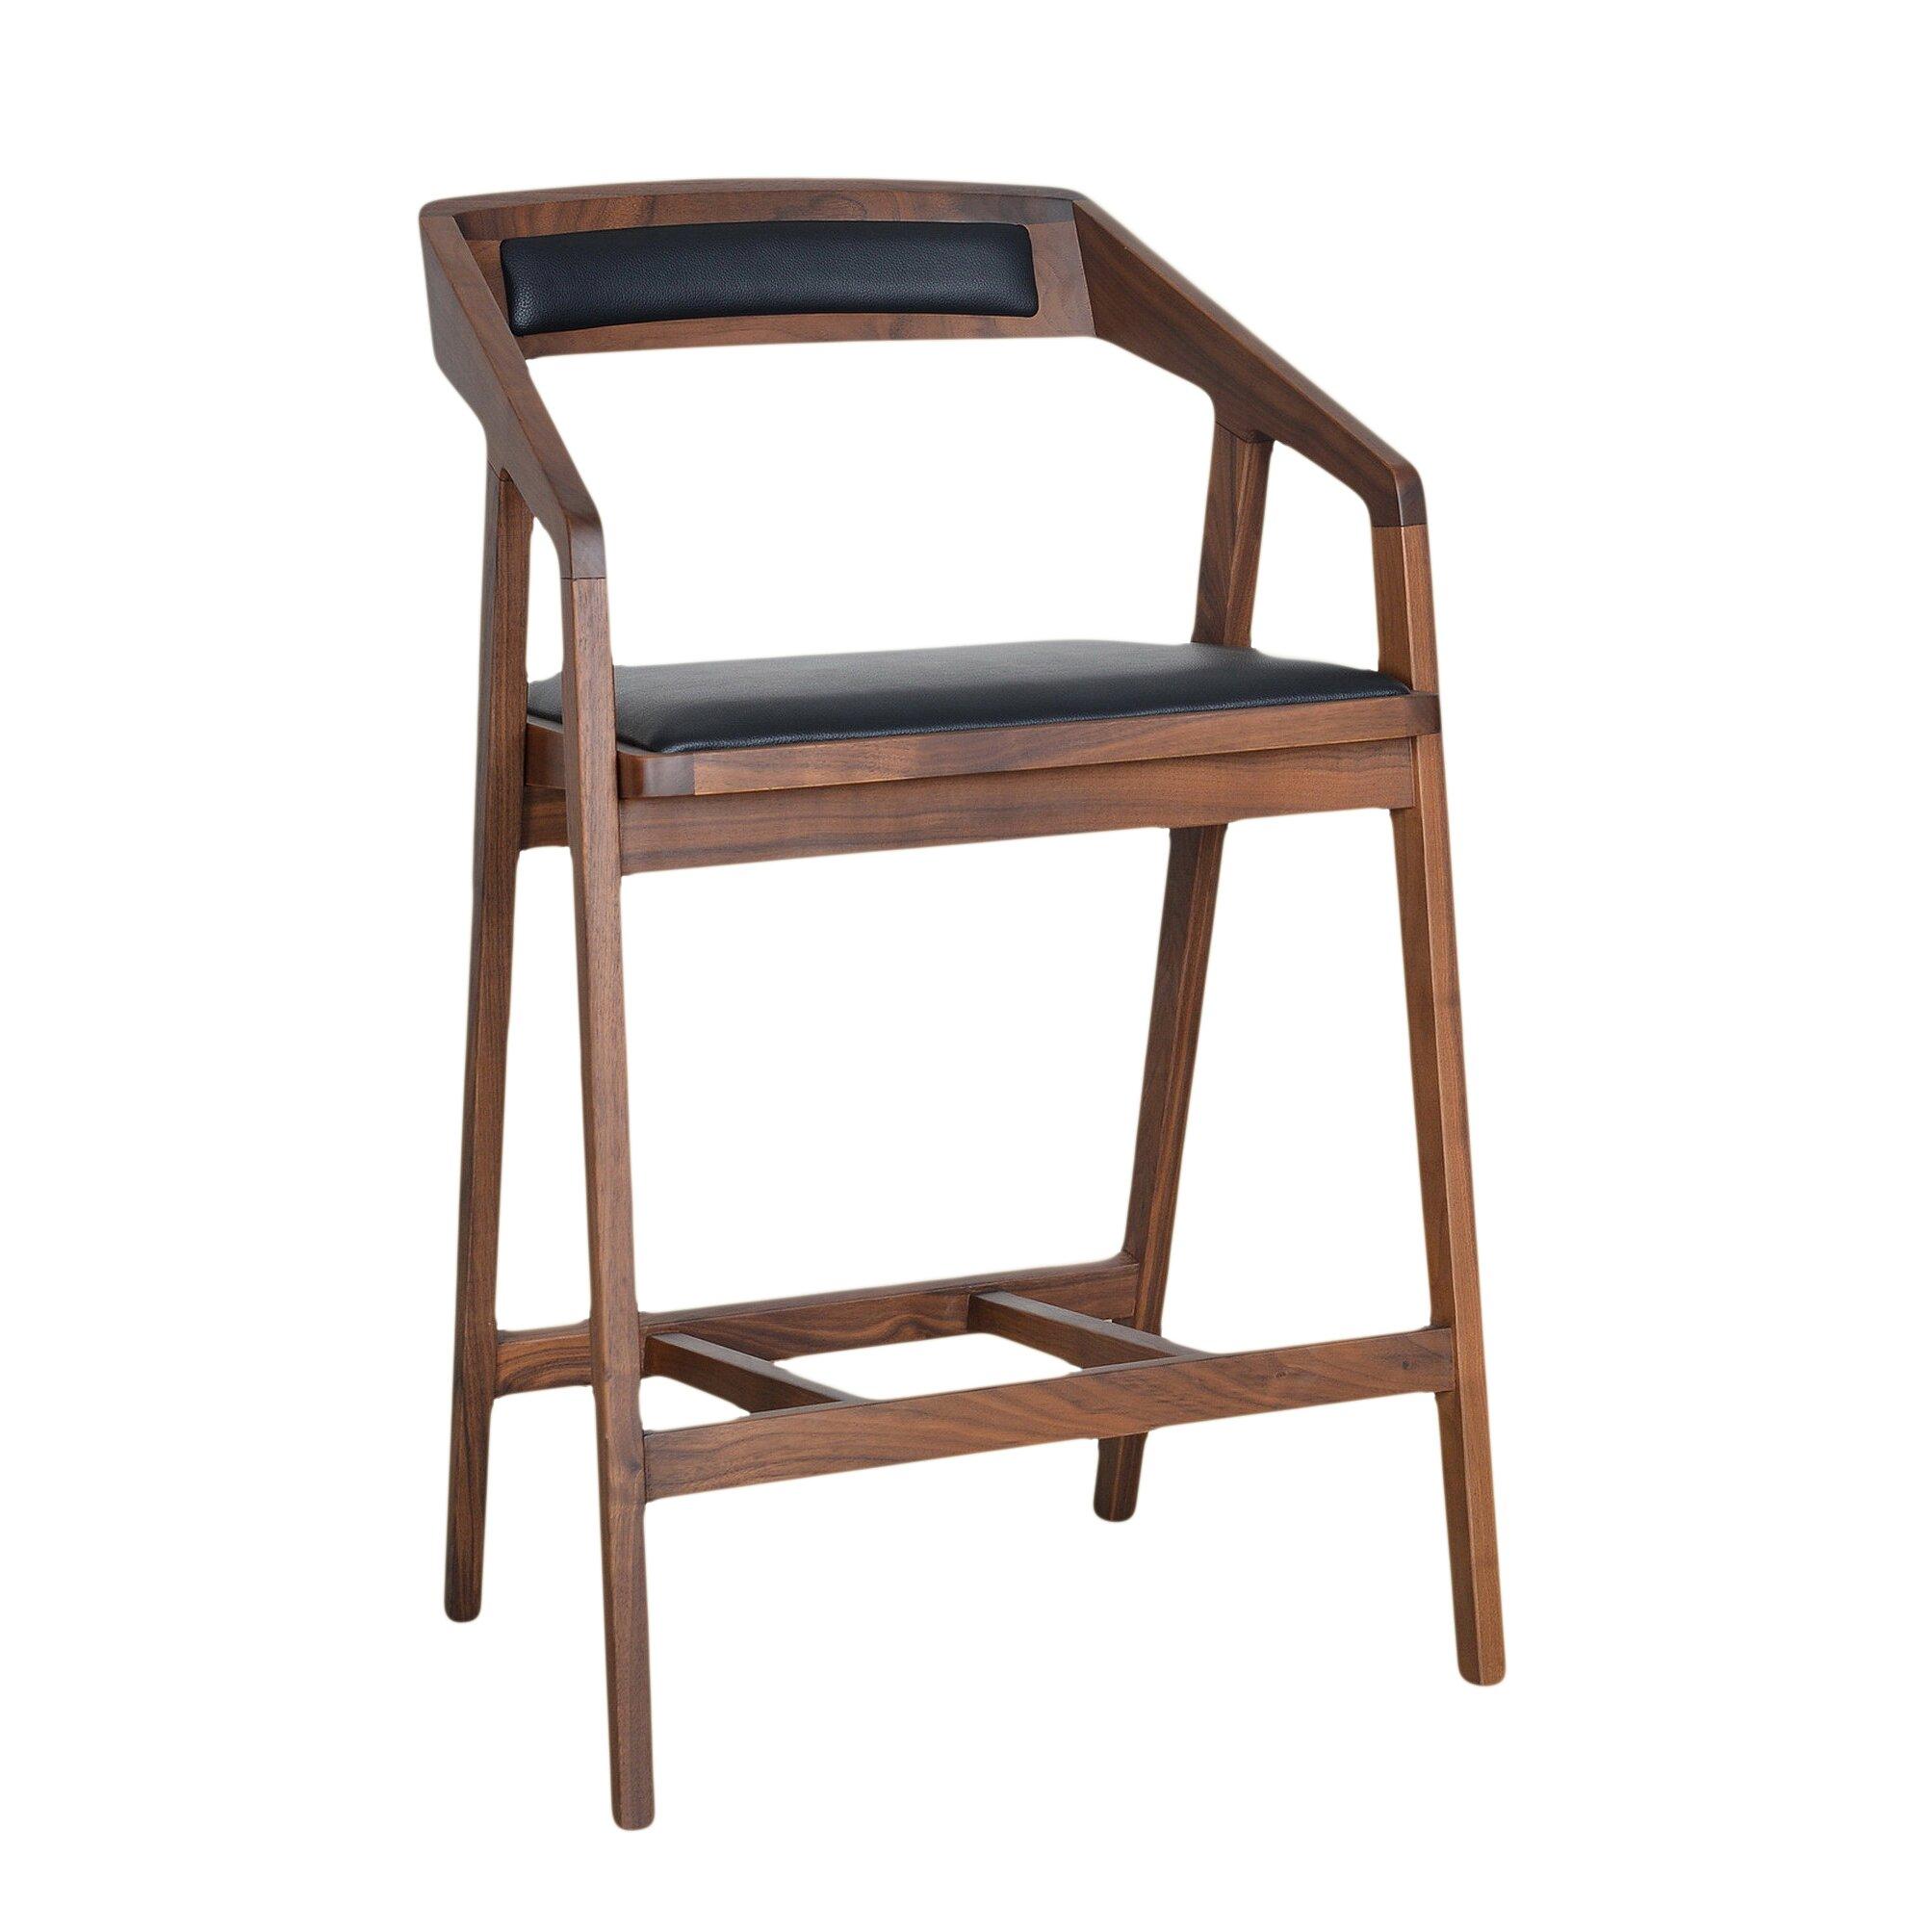 Moe 39 s home collection padma 26 bar stool reviews wayfair for I furniture reviews